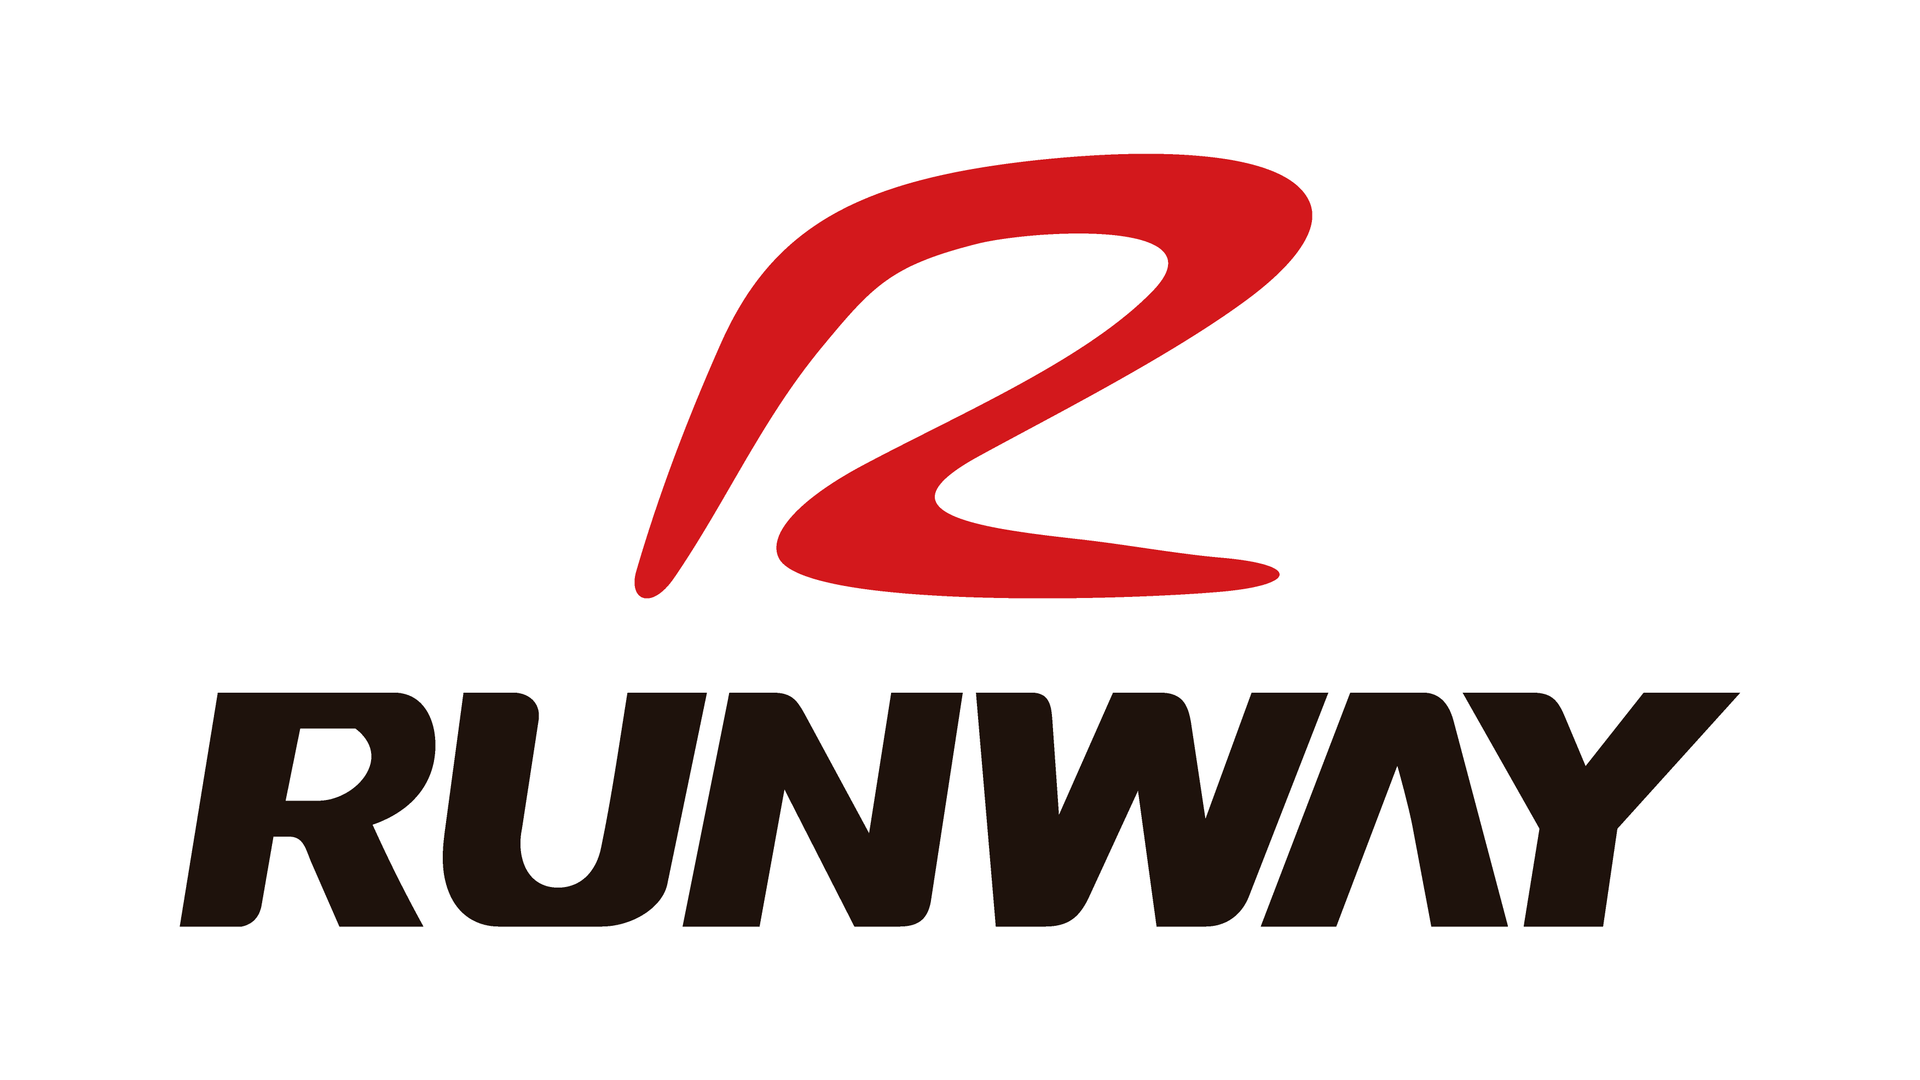 Runway Gym